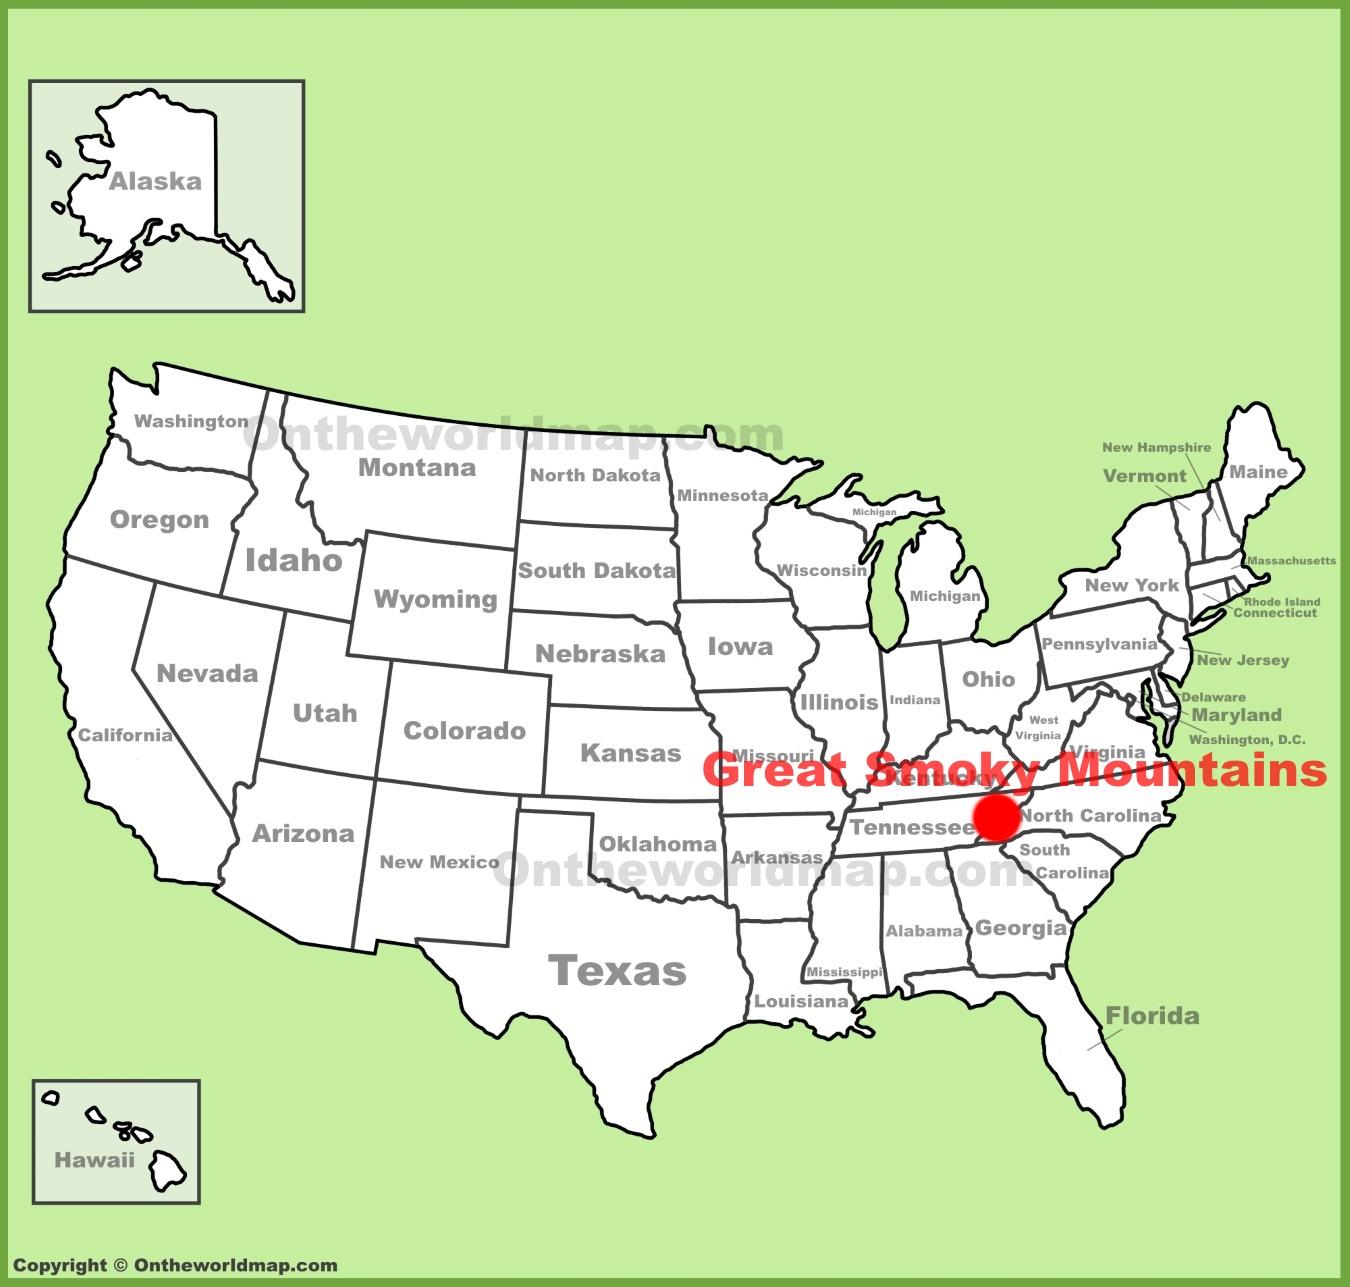 Great Smoky Mountains Map Great Smoky Mountains Maps | USA | Maps of Great Smoky Mountains